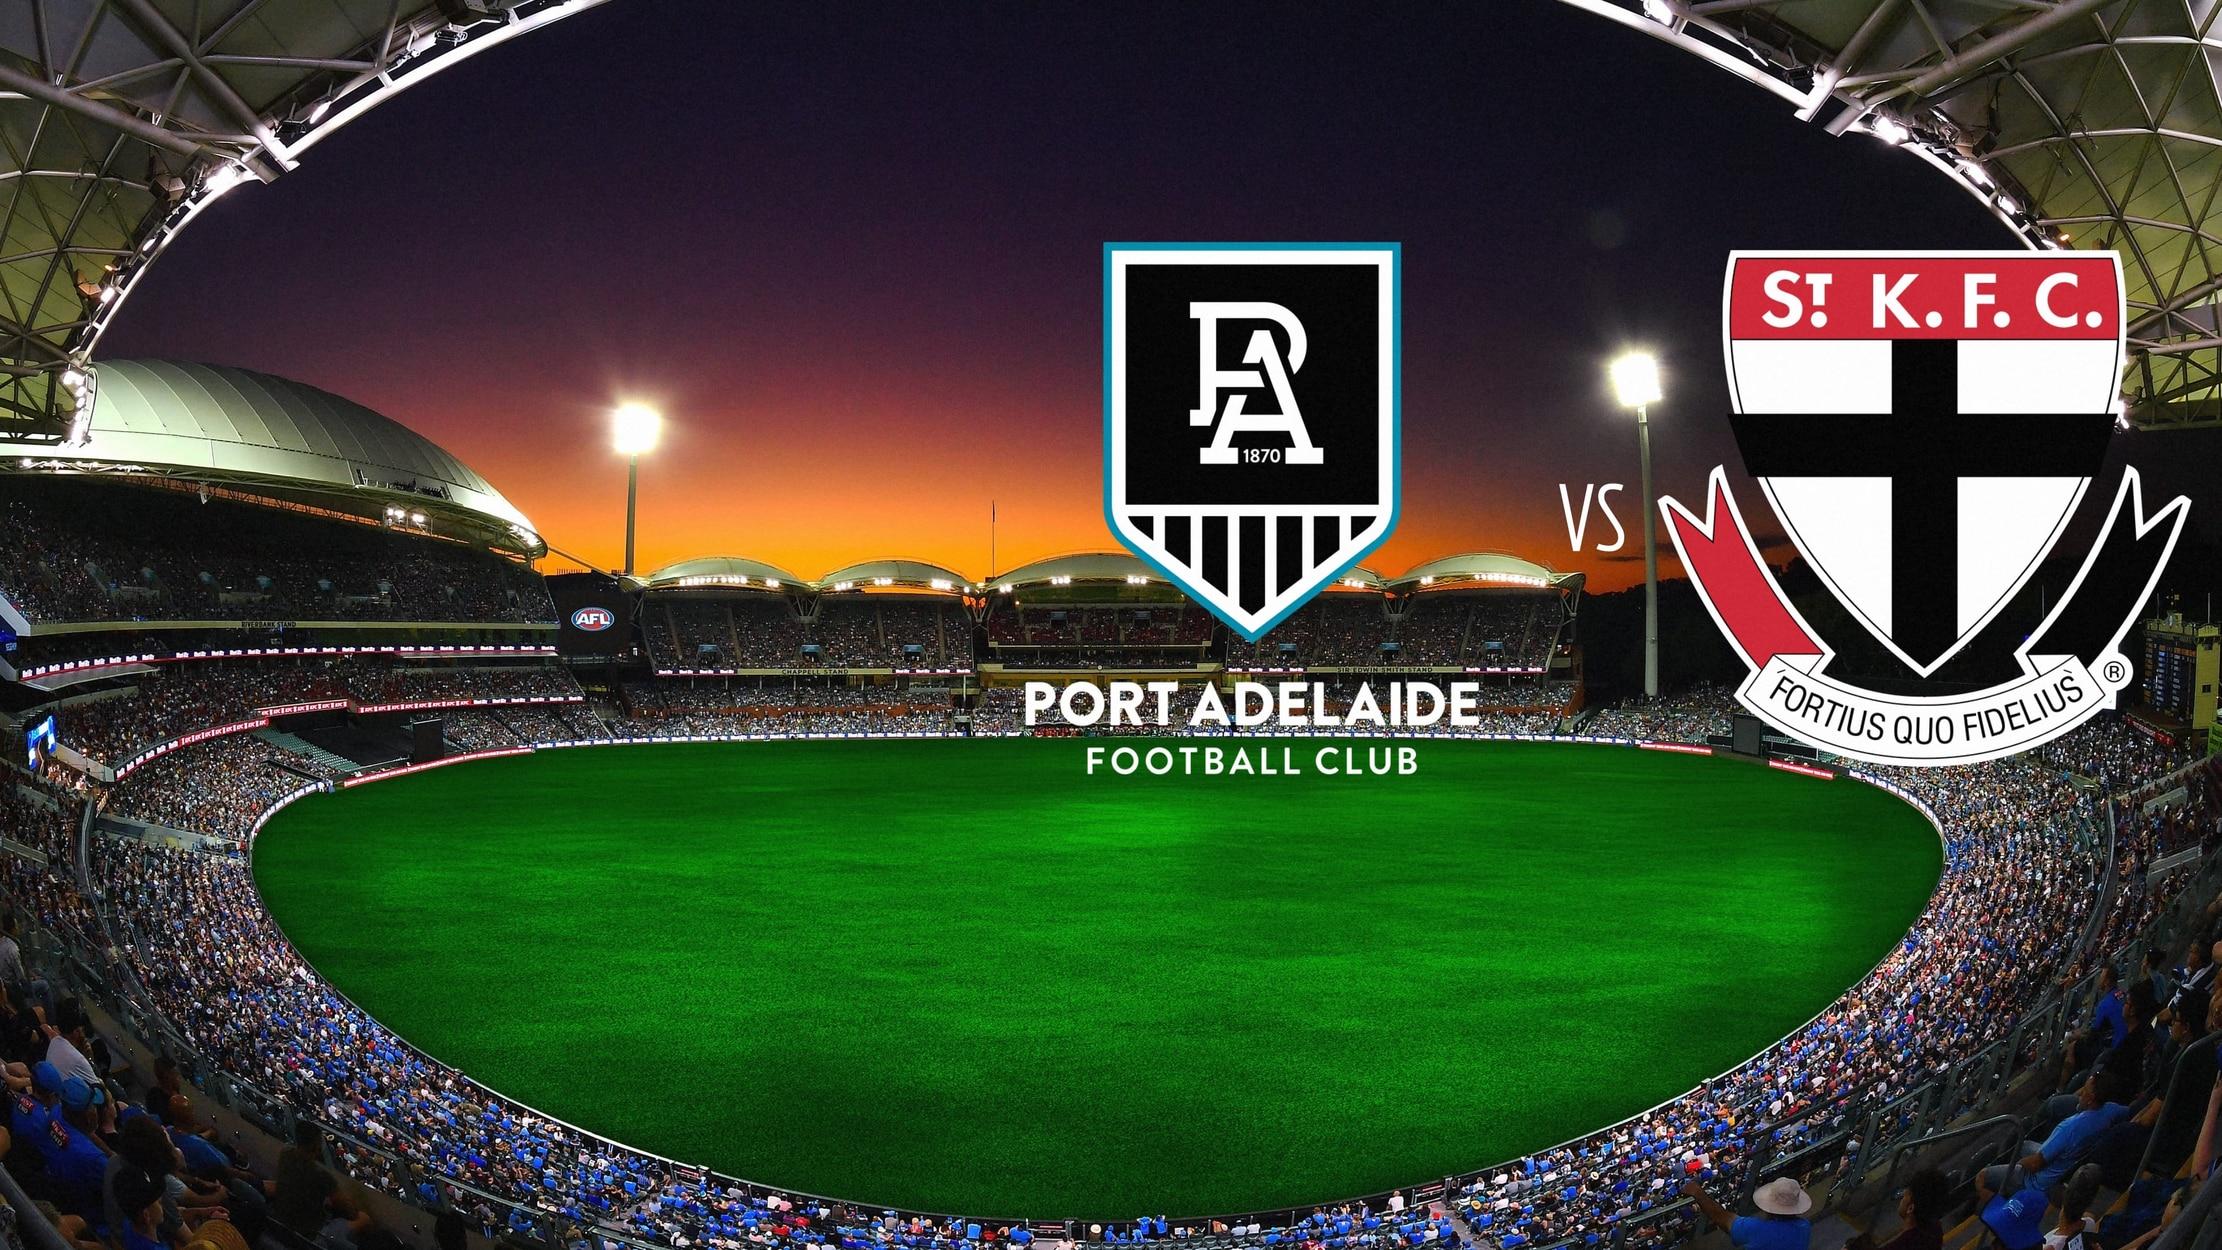 AFL Premiership Football - Port Adelaide Power vs. St. Kilda Saints